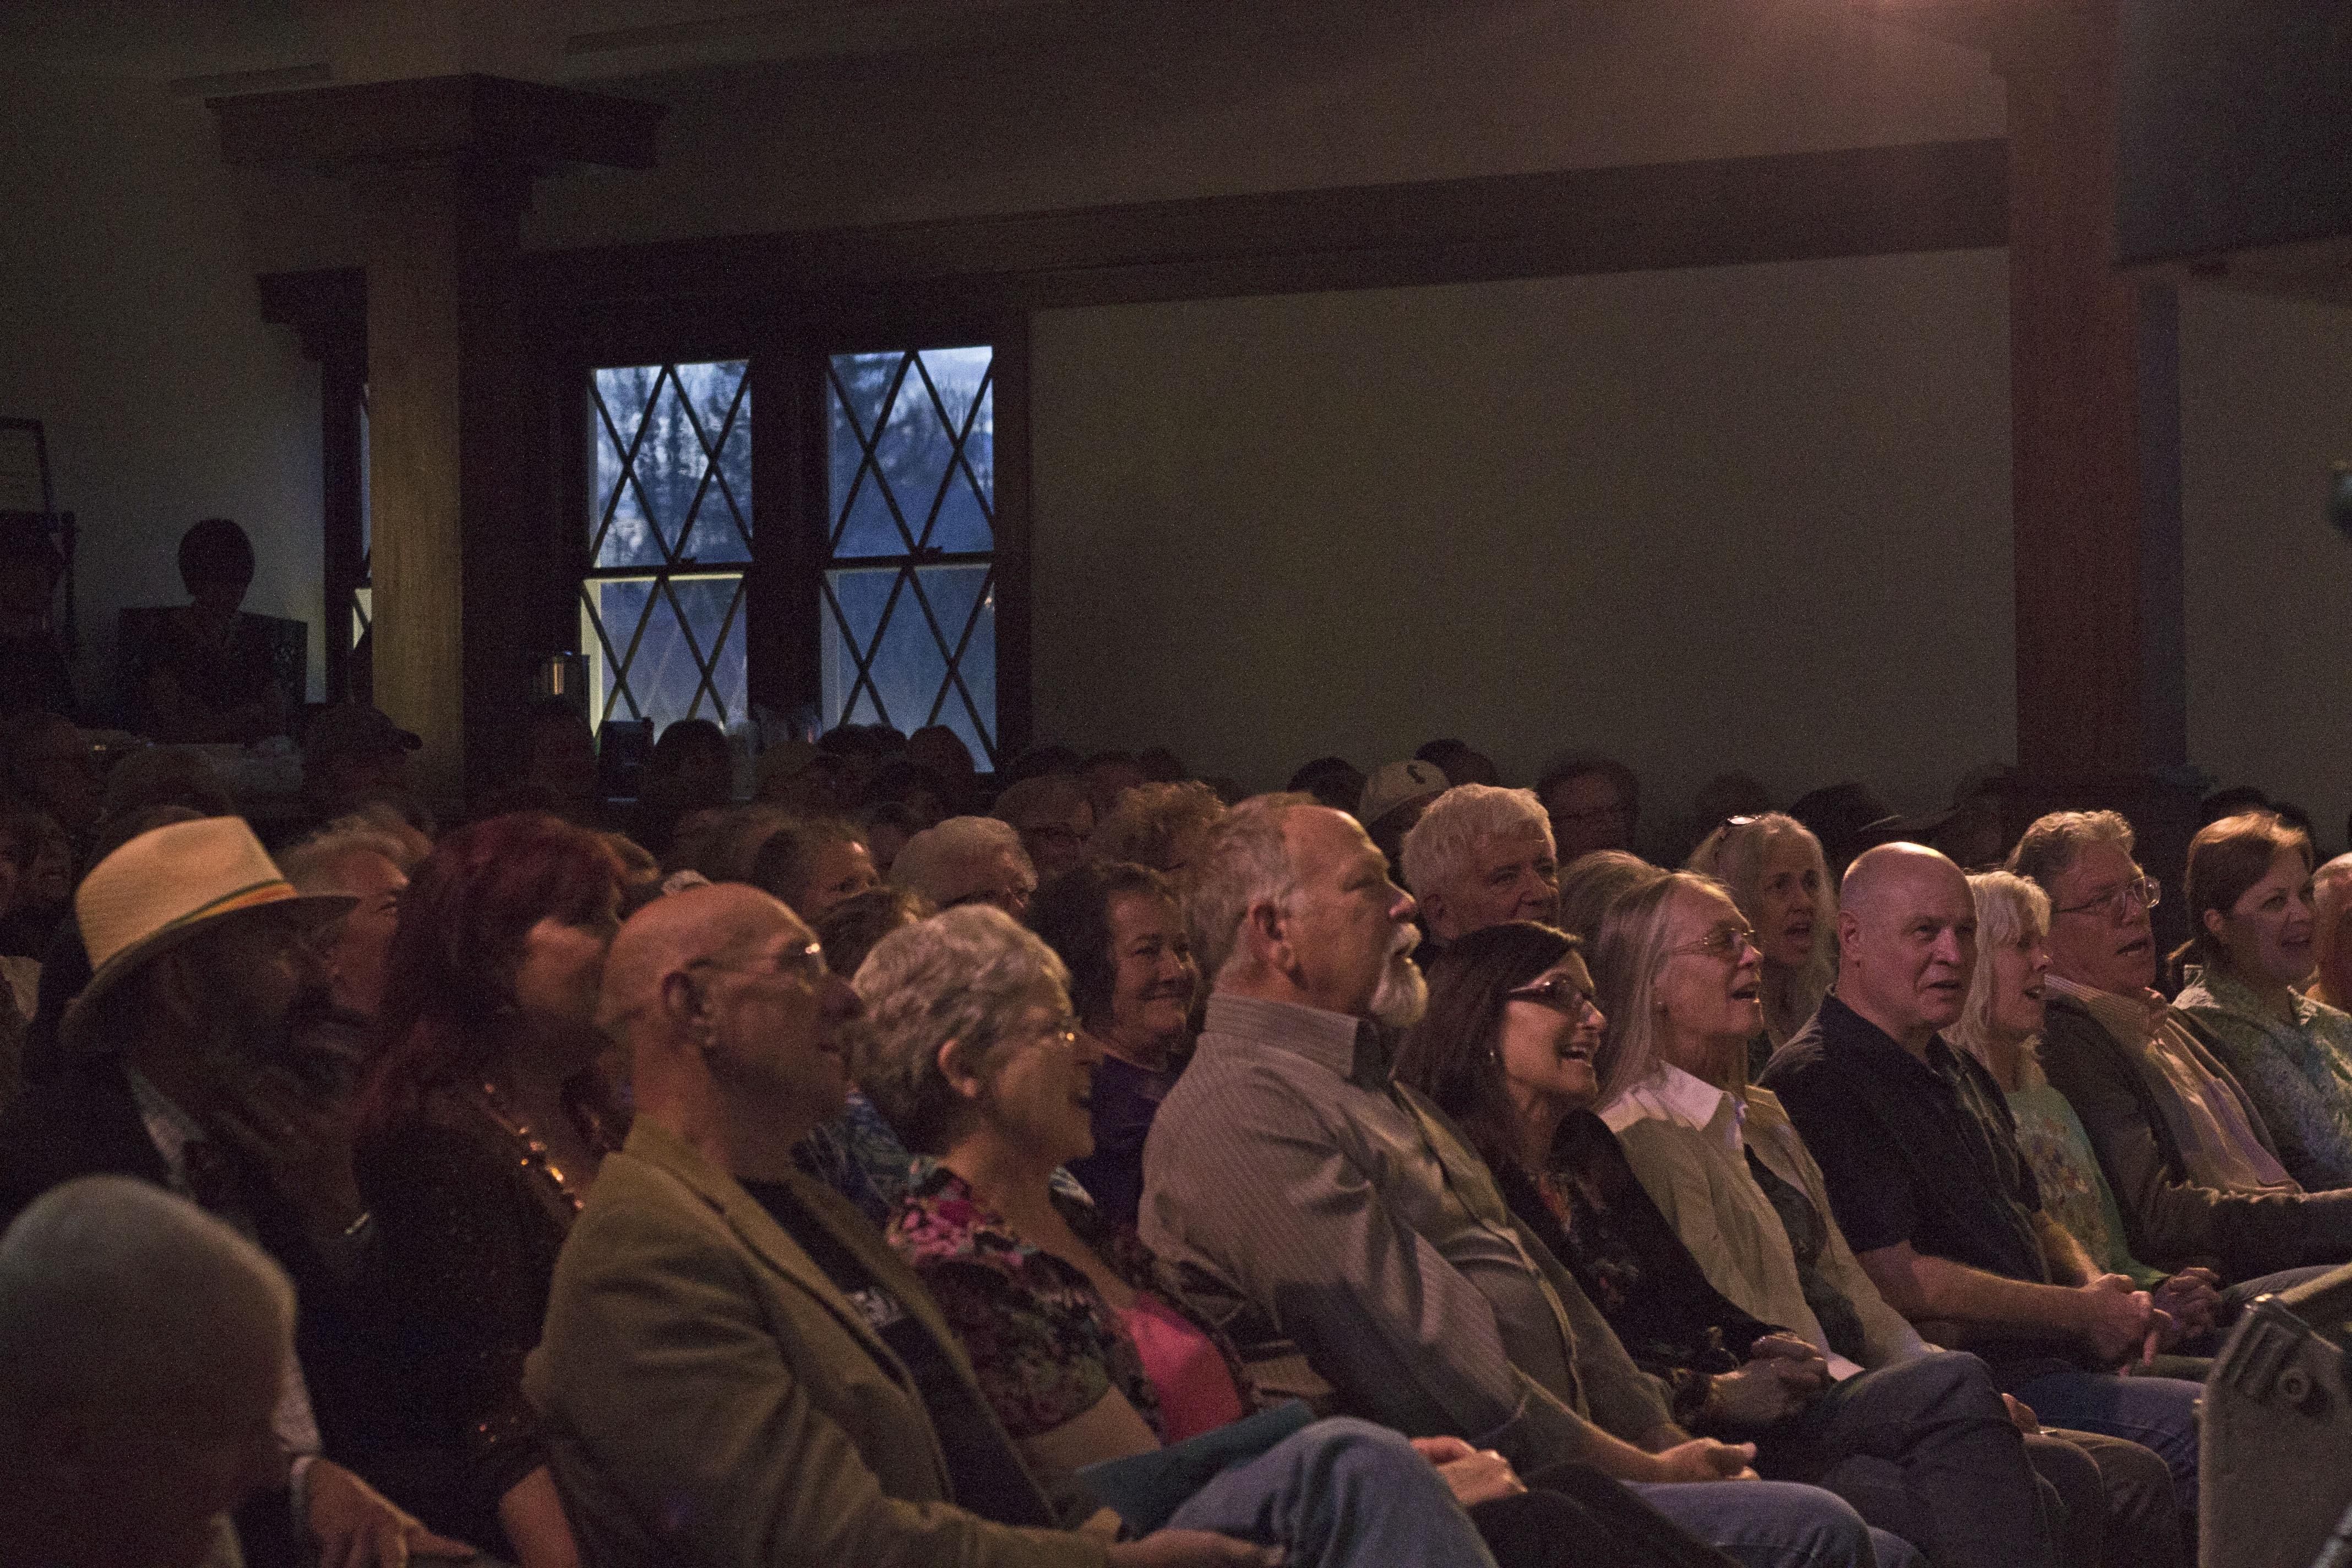 Full House for SLV Cancer Relief